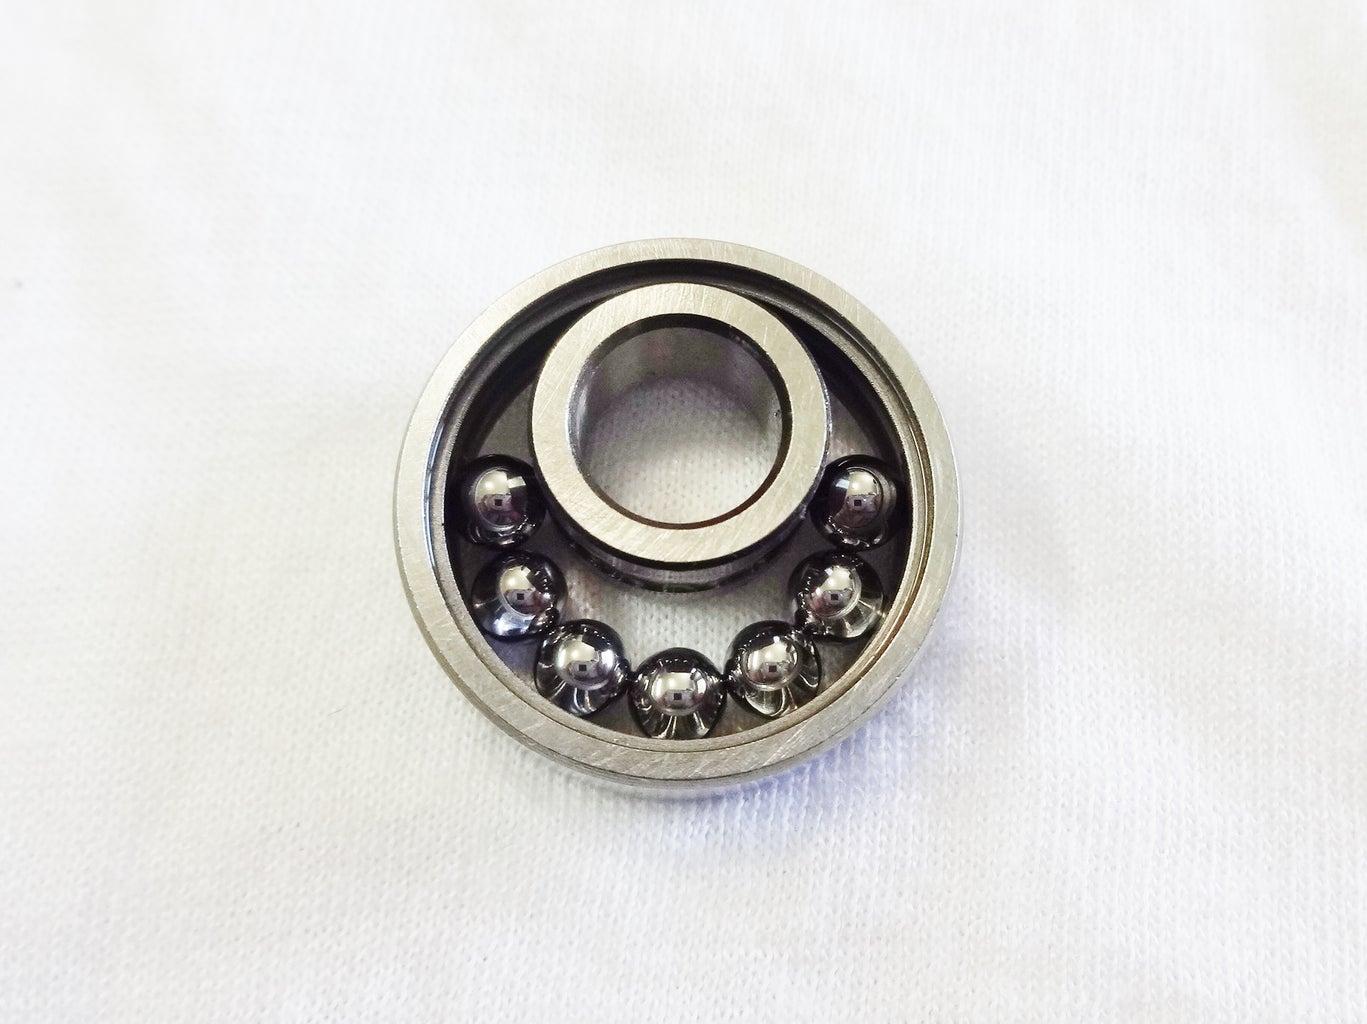 Remove Center Ring